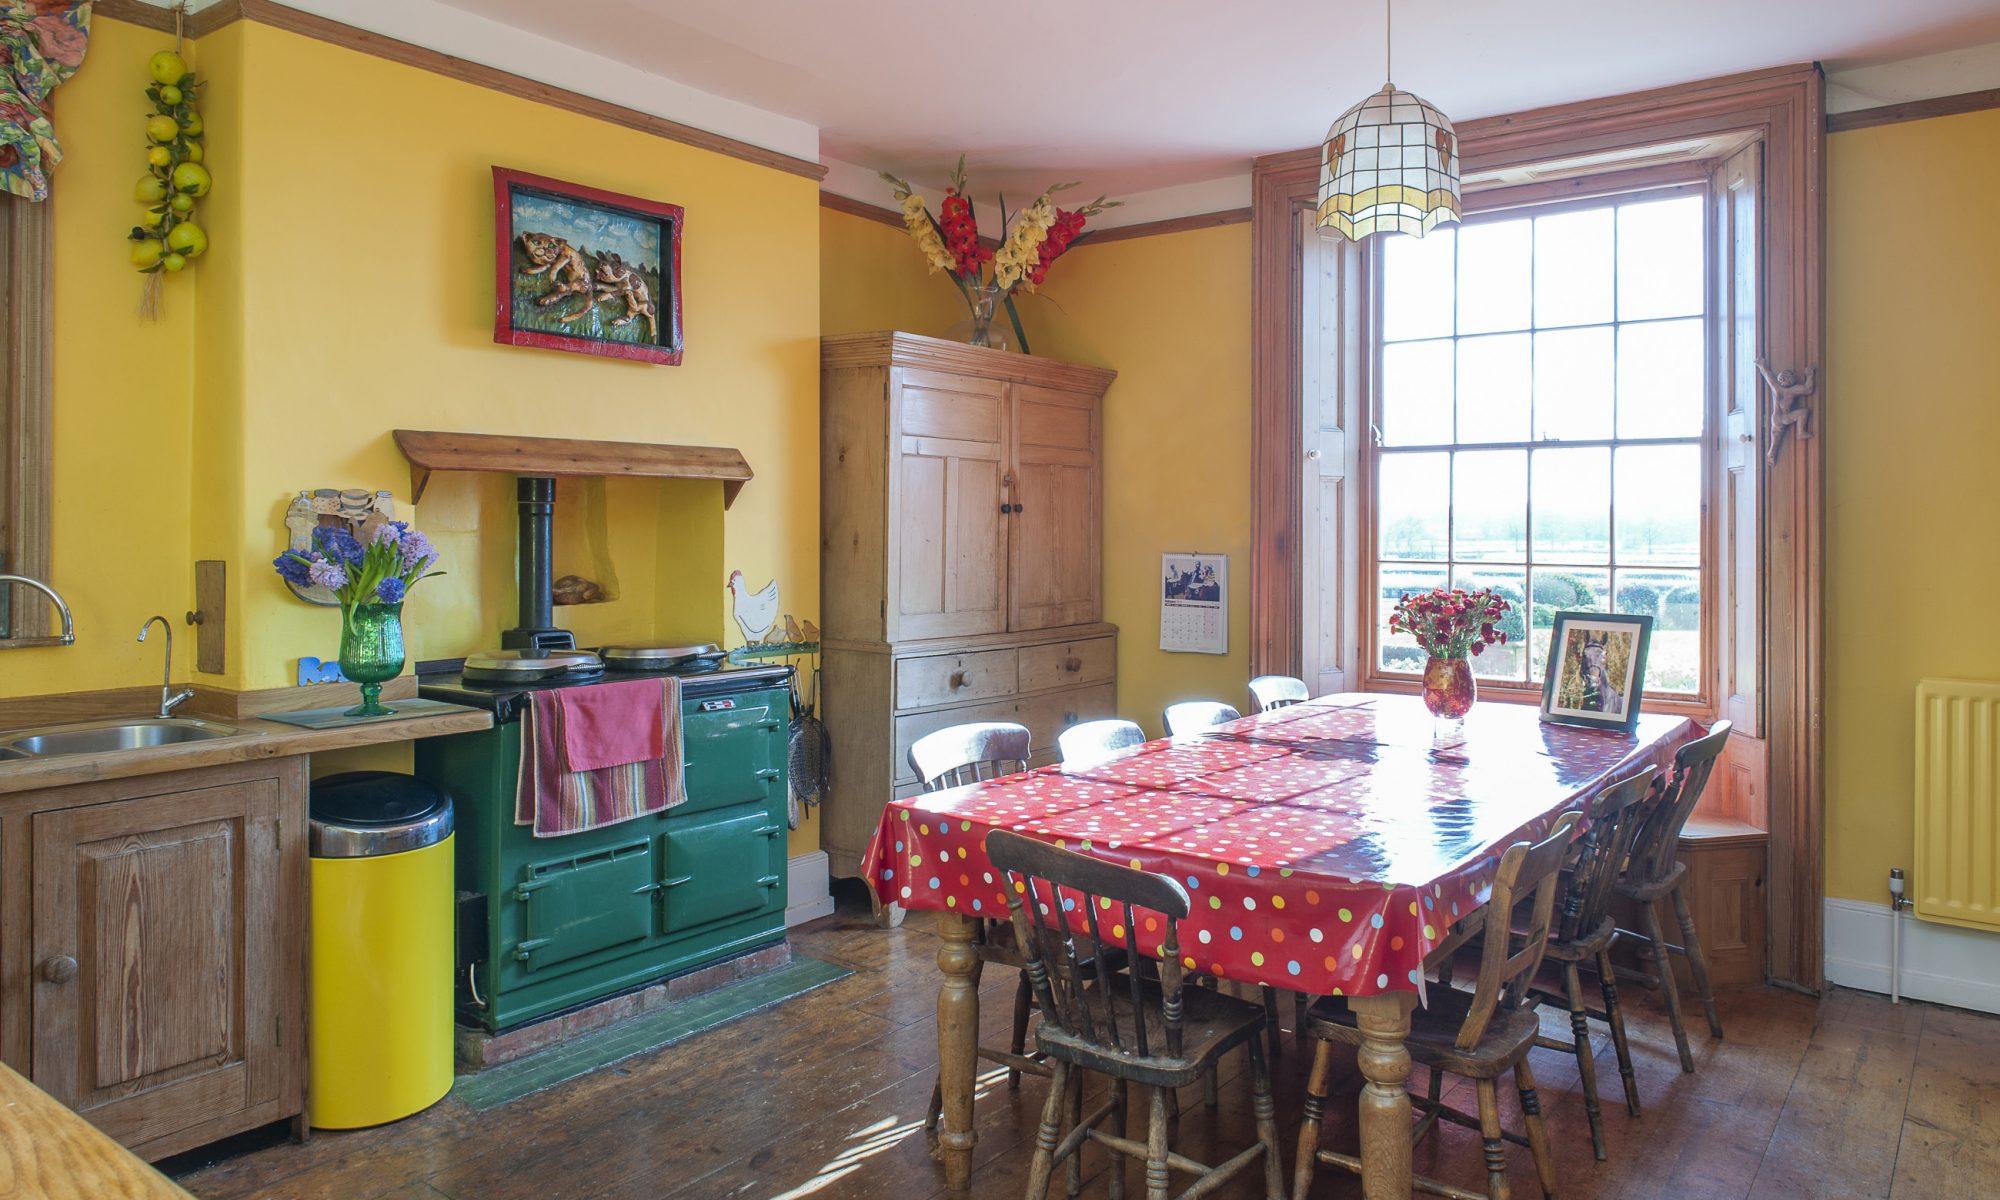 Georgian Farmhouse Transformed Into Colourful Family Home